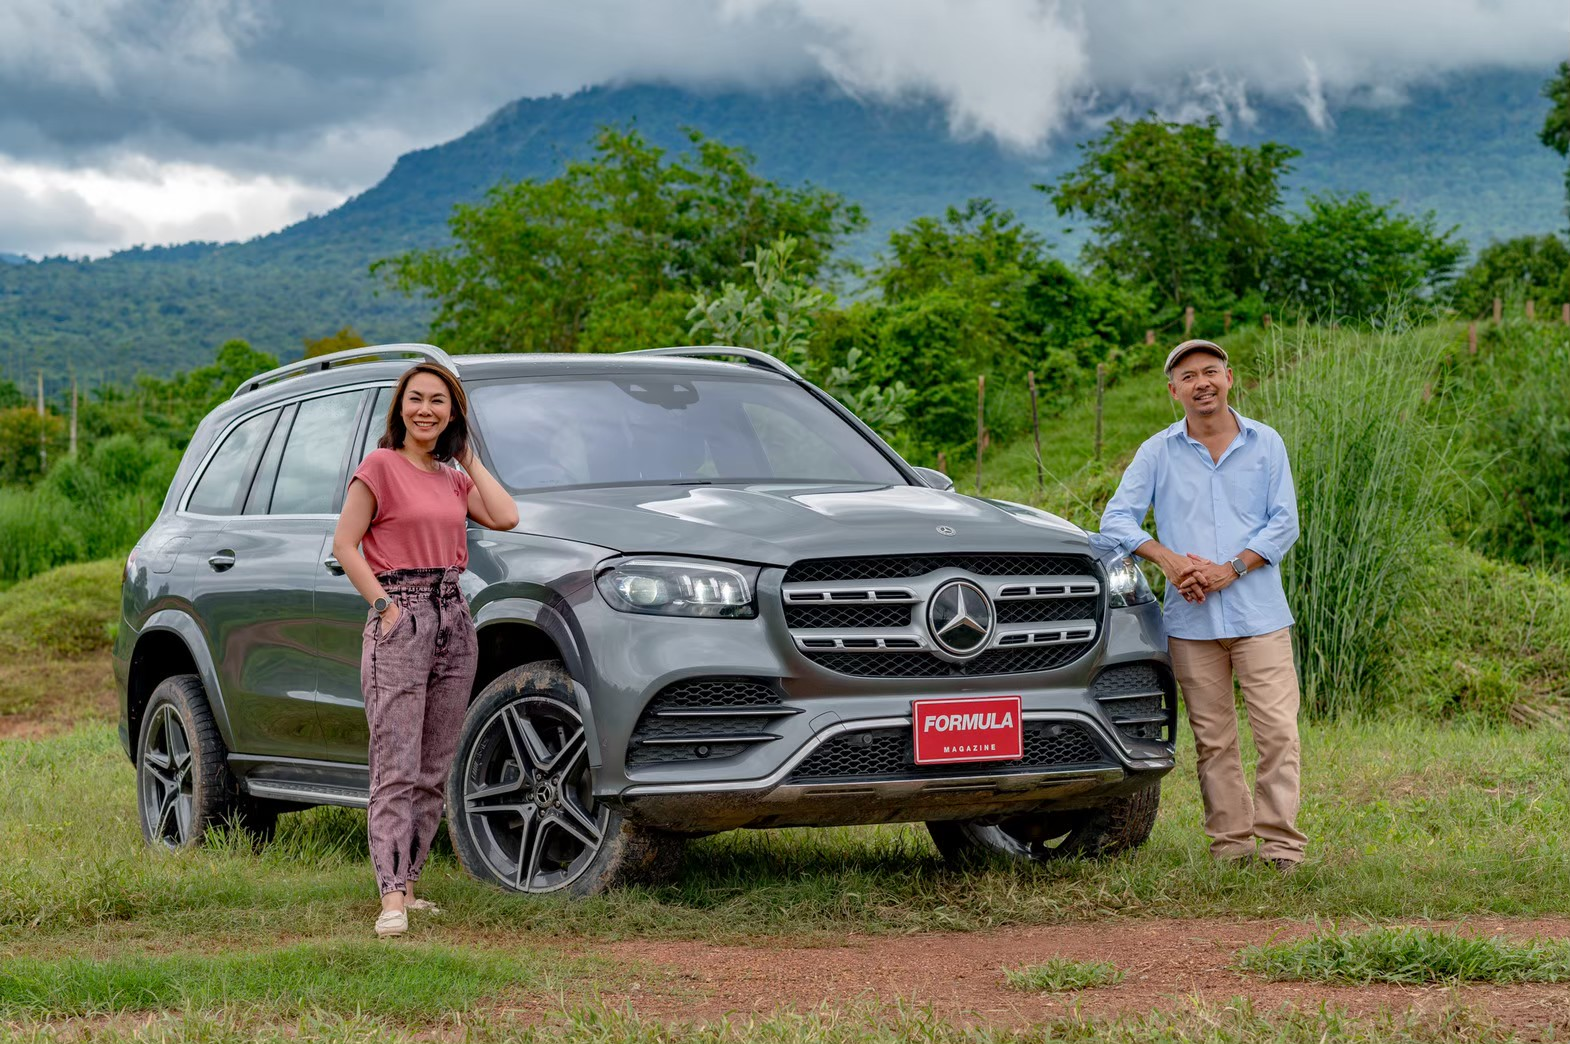 Mercdes-Benz GLS Test พี่น้องลองรถ (6)